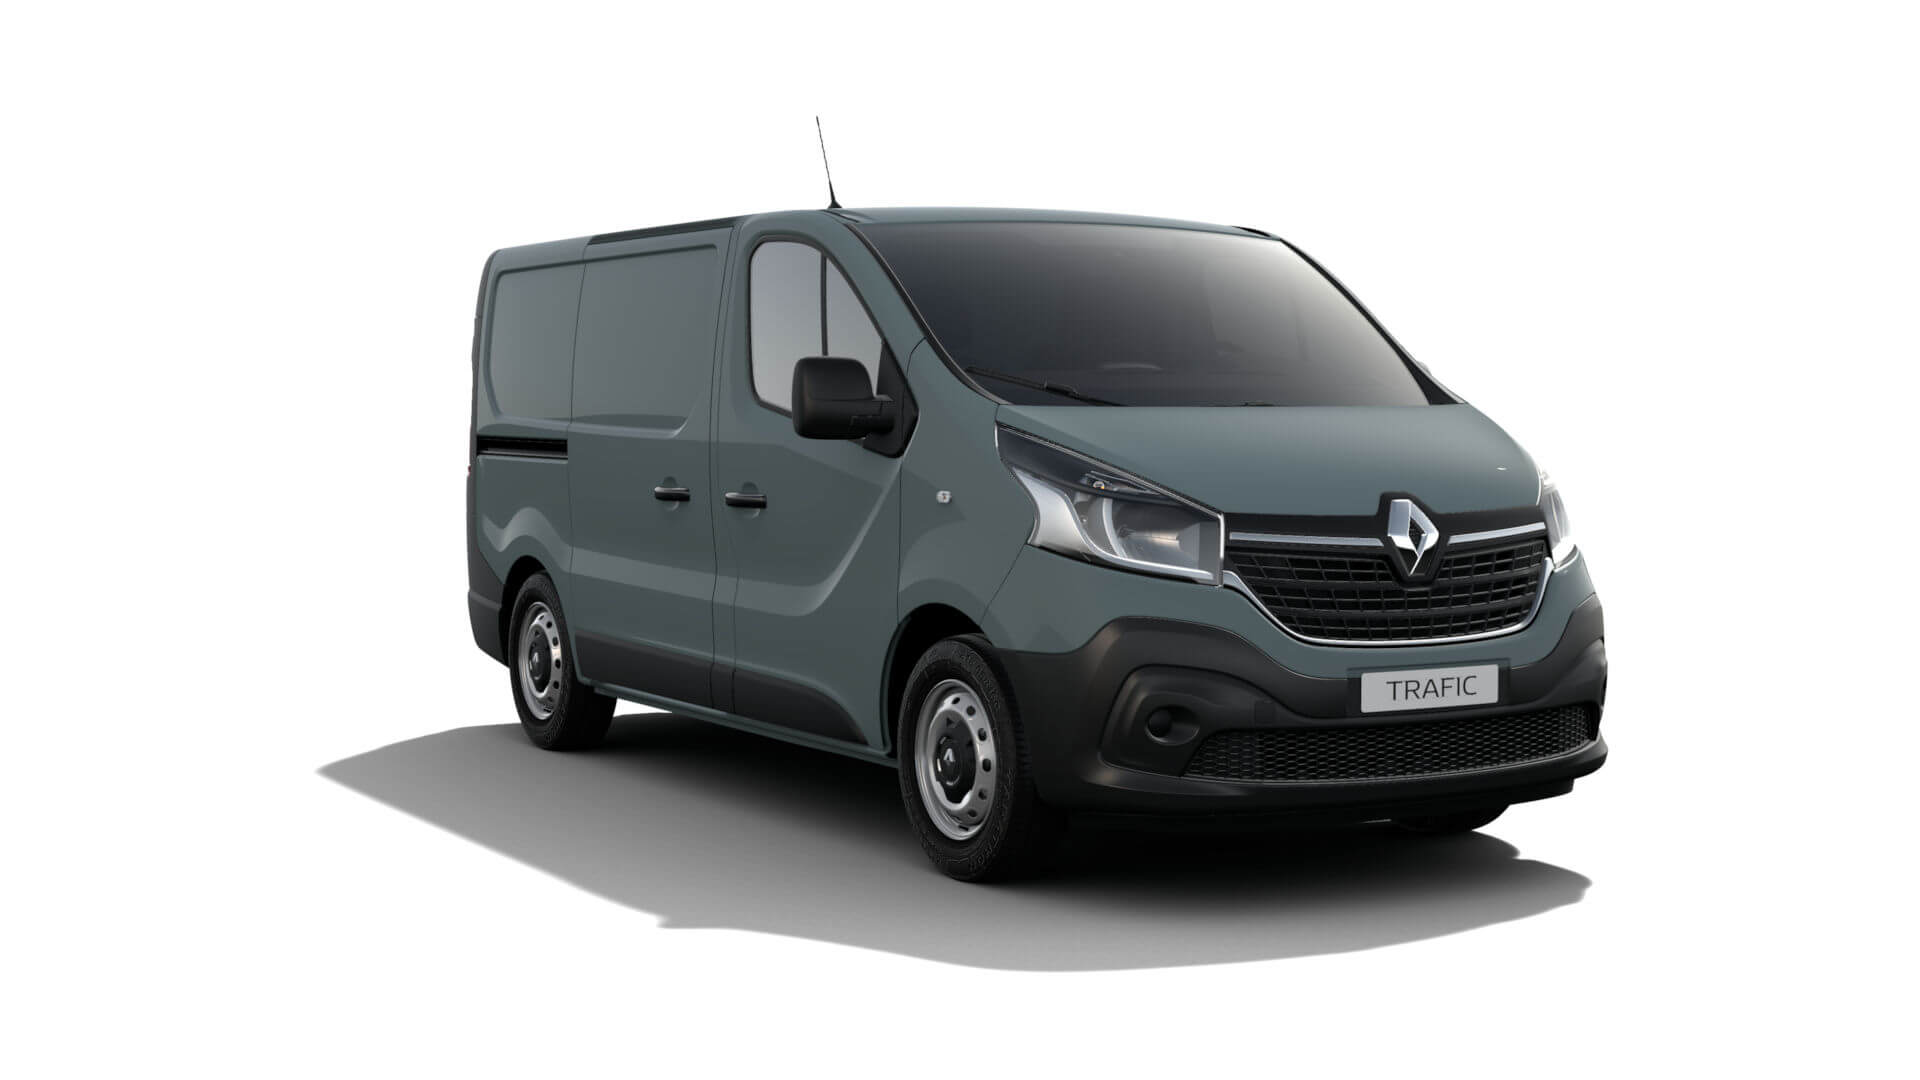 Automodell Sprinter graublau - Renault NFZ Trafic - Renault Ahrens Hannover